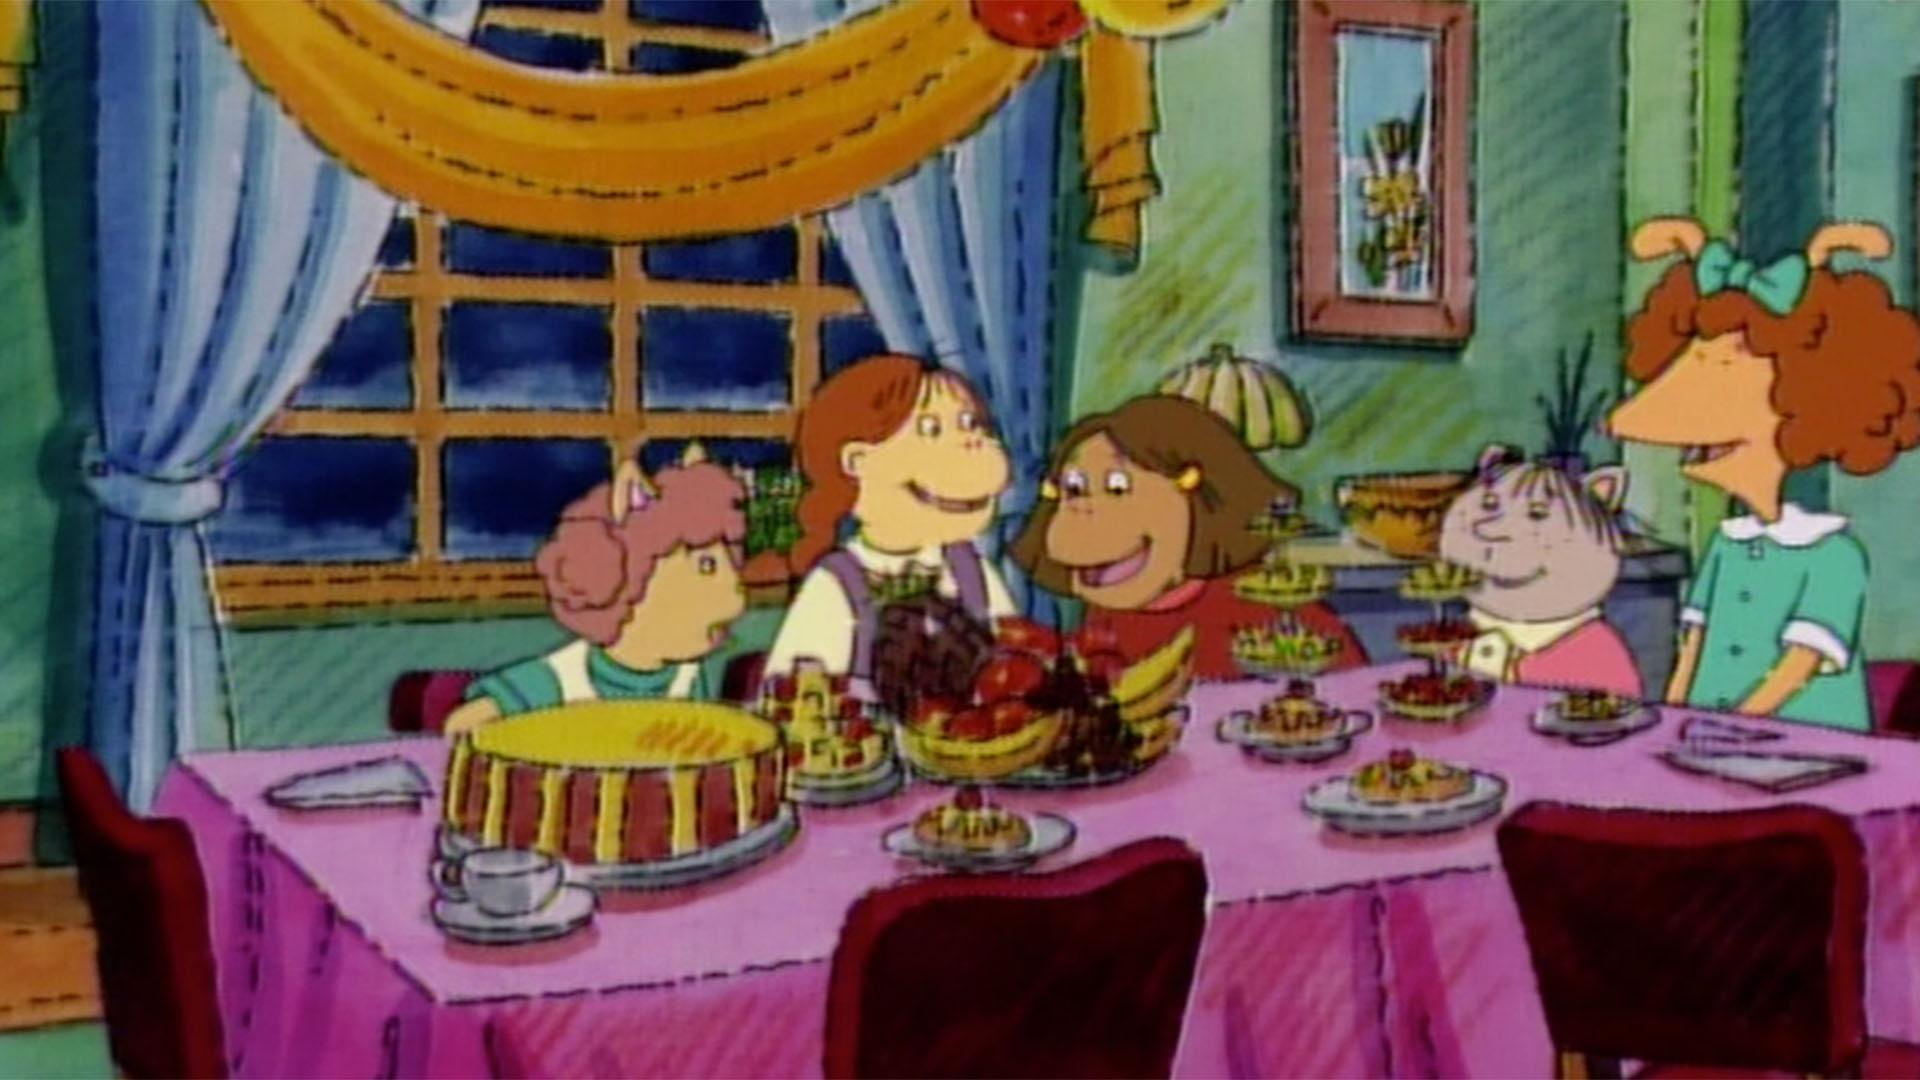 Arthur Grandma Thora Appreciation Day/Fern's Slumber Party on